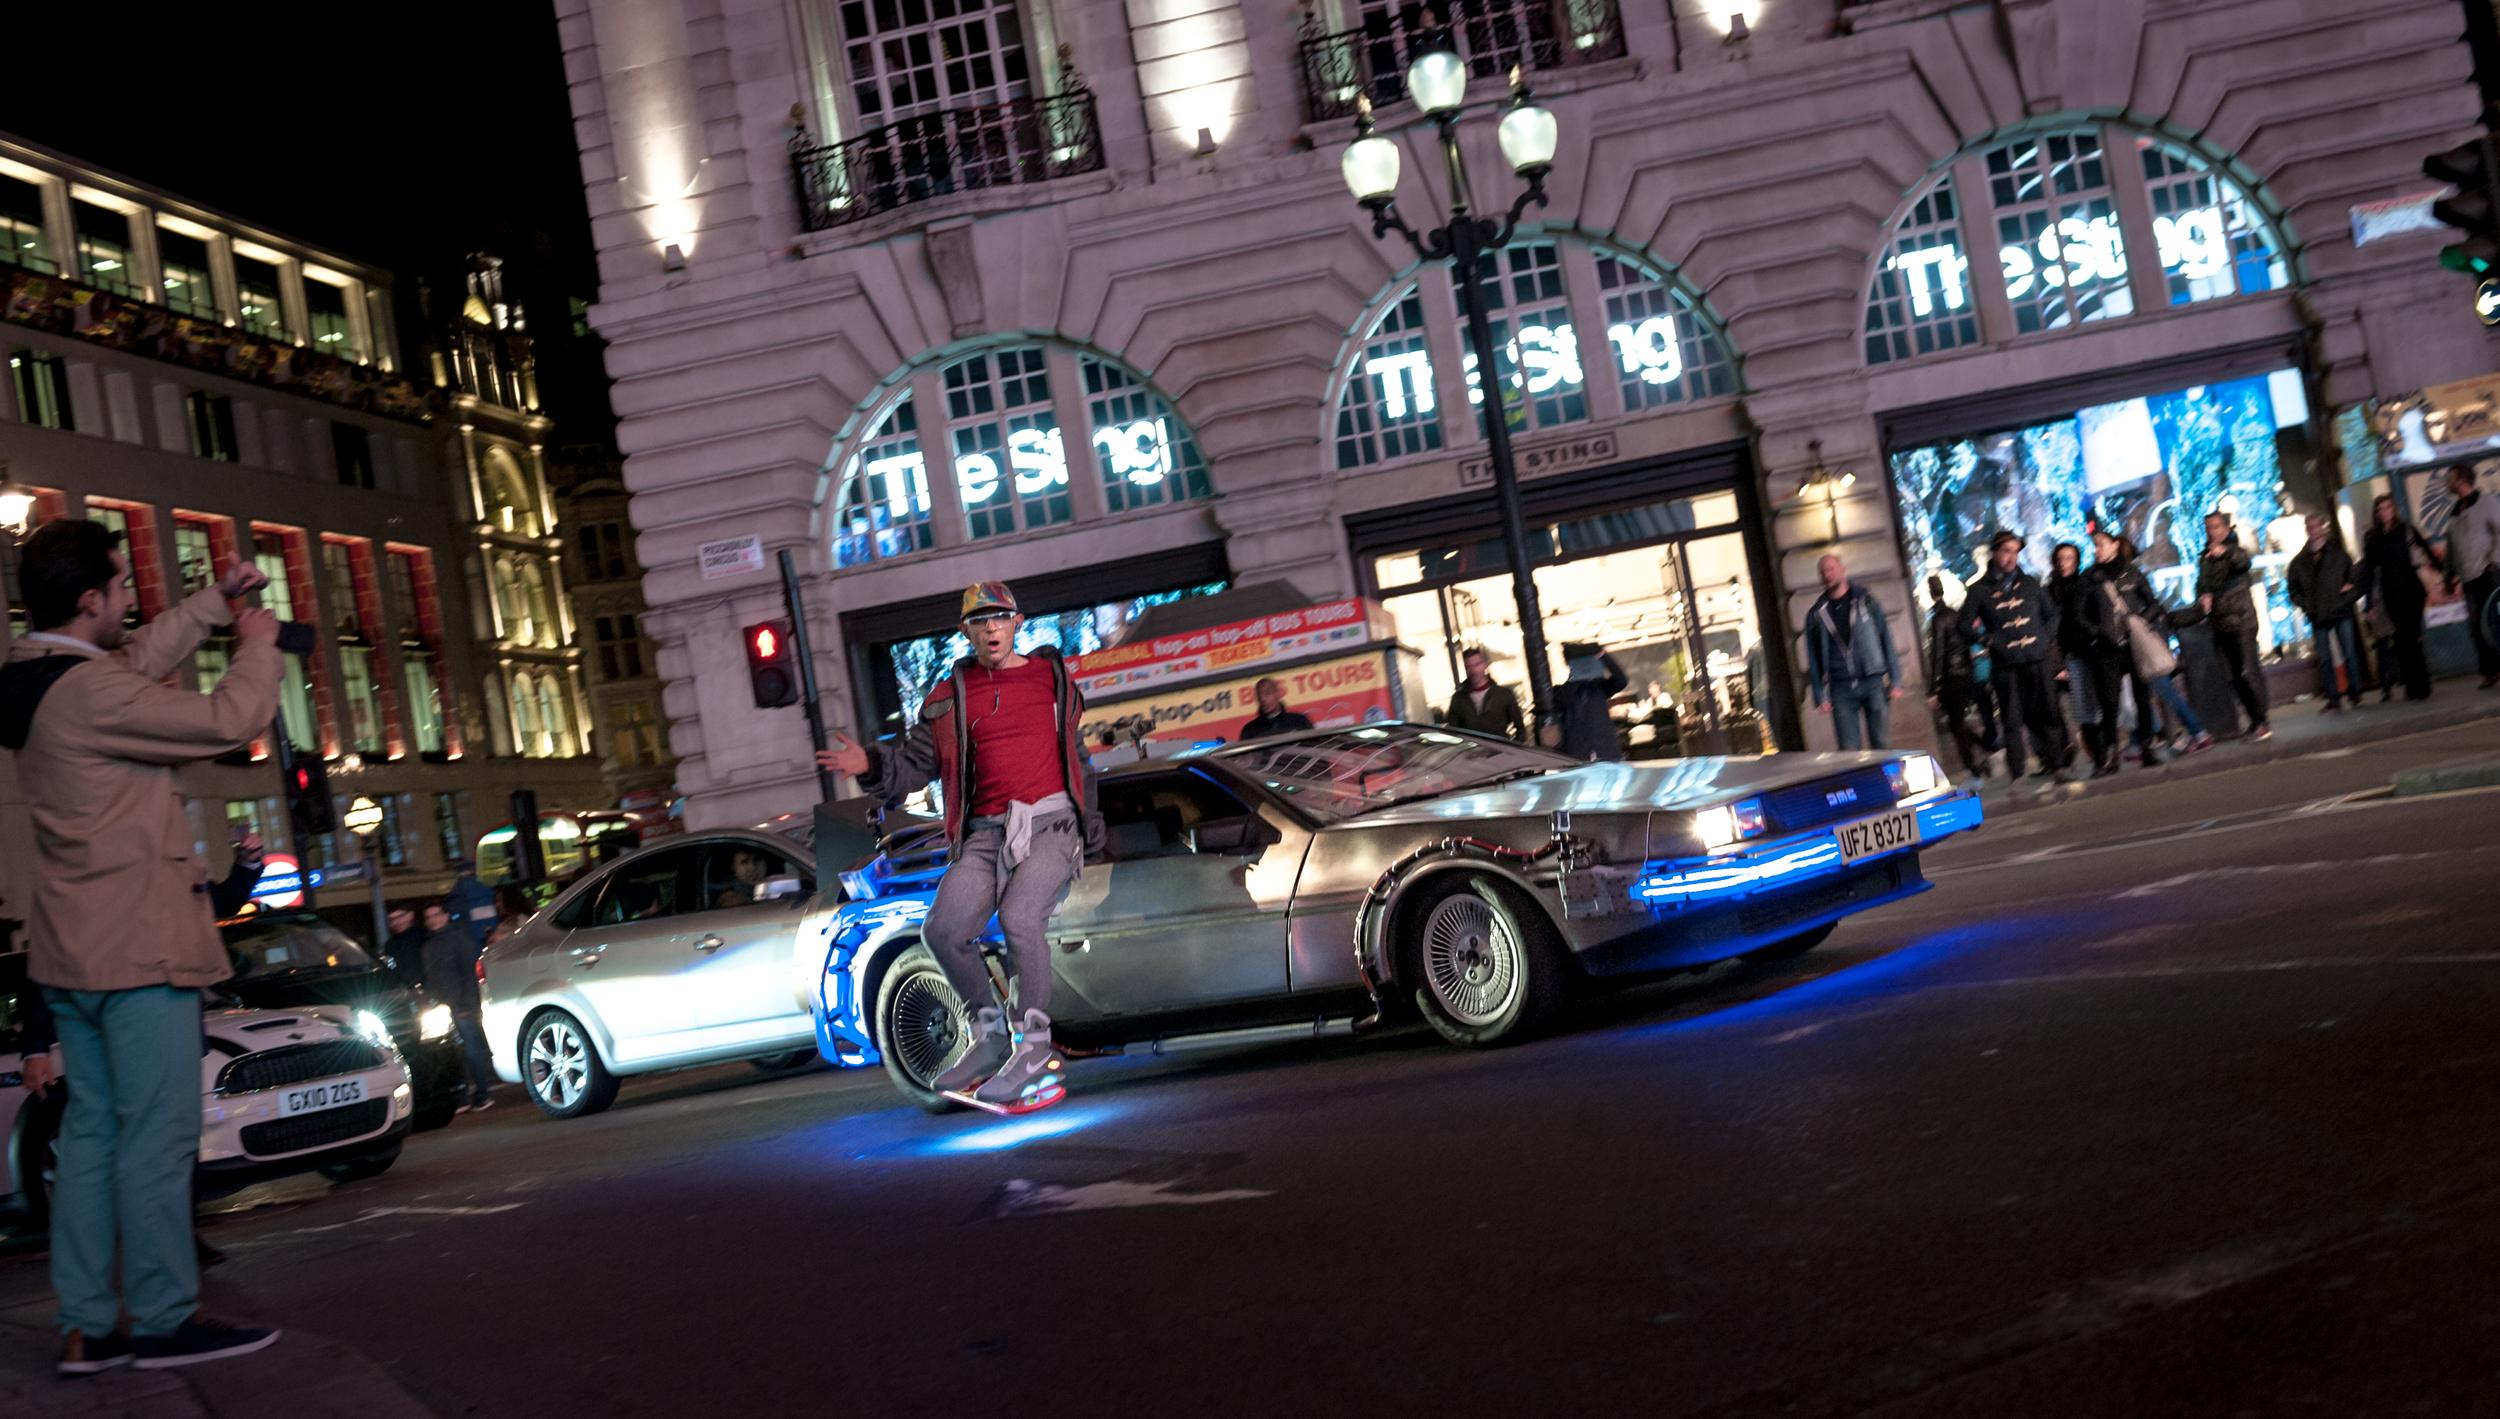 Jason Bradbury in Piccadilly Circus